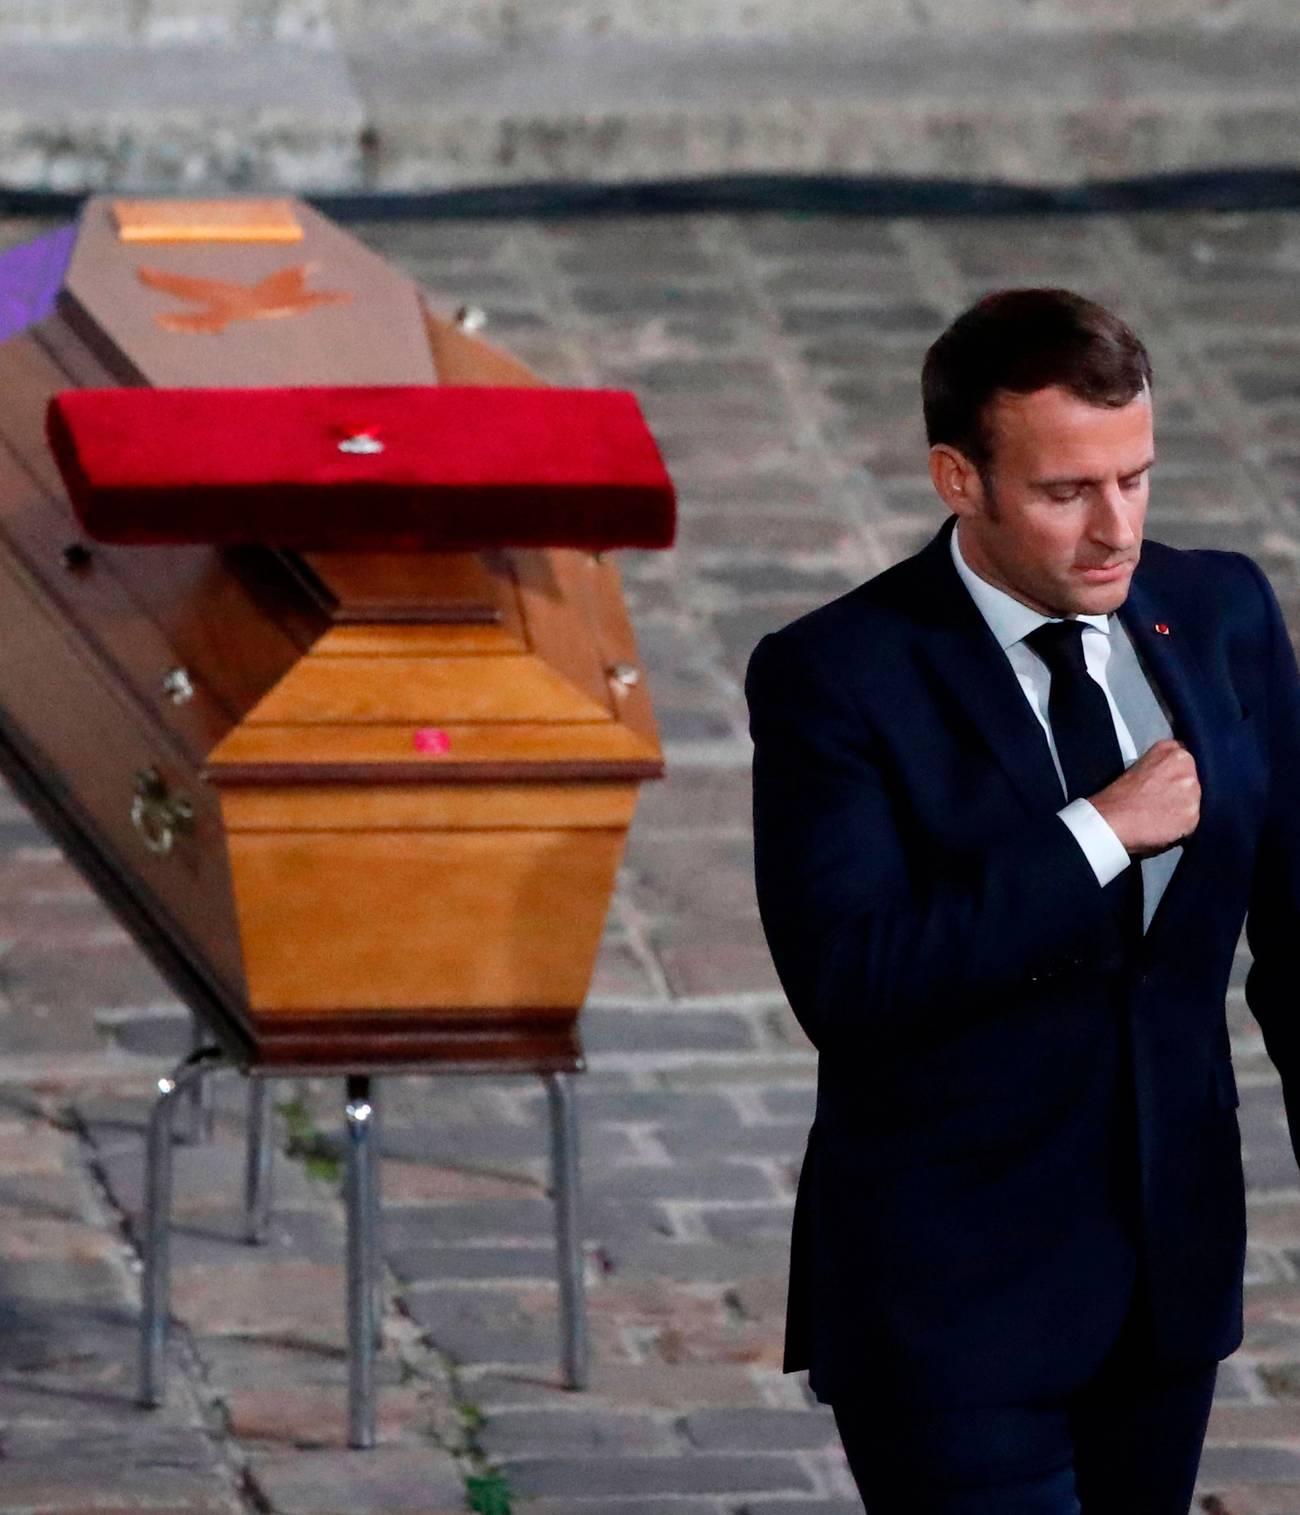 FRANCOIS MORI/POOL/AFP via Getty Images